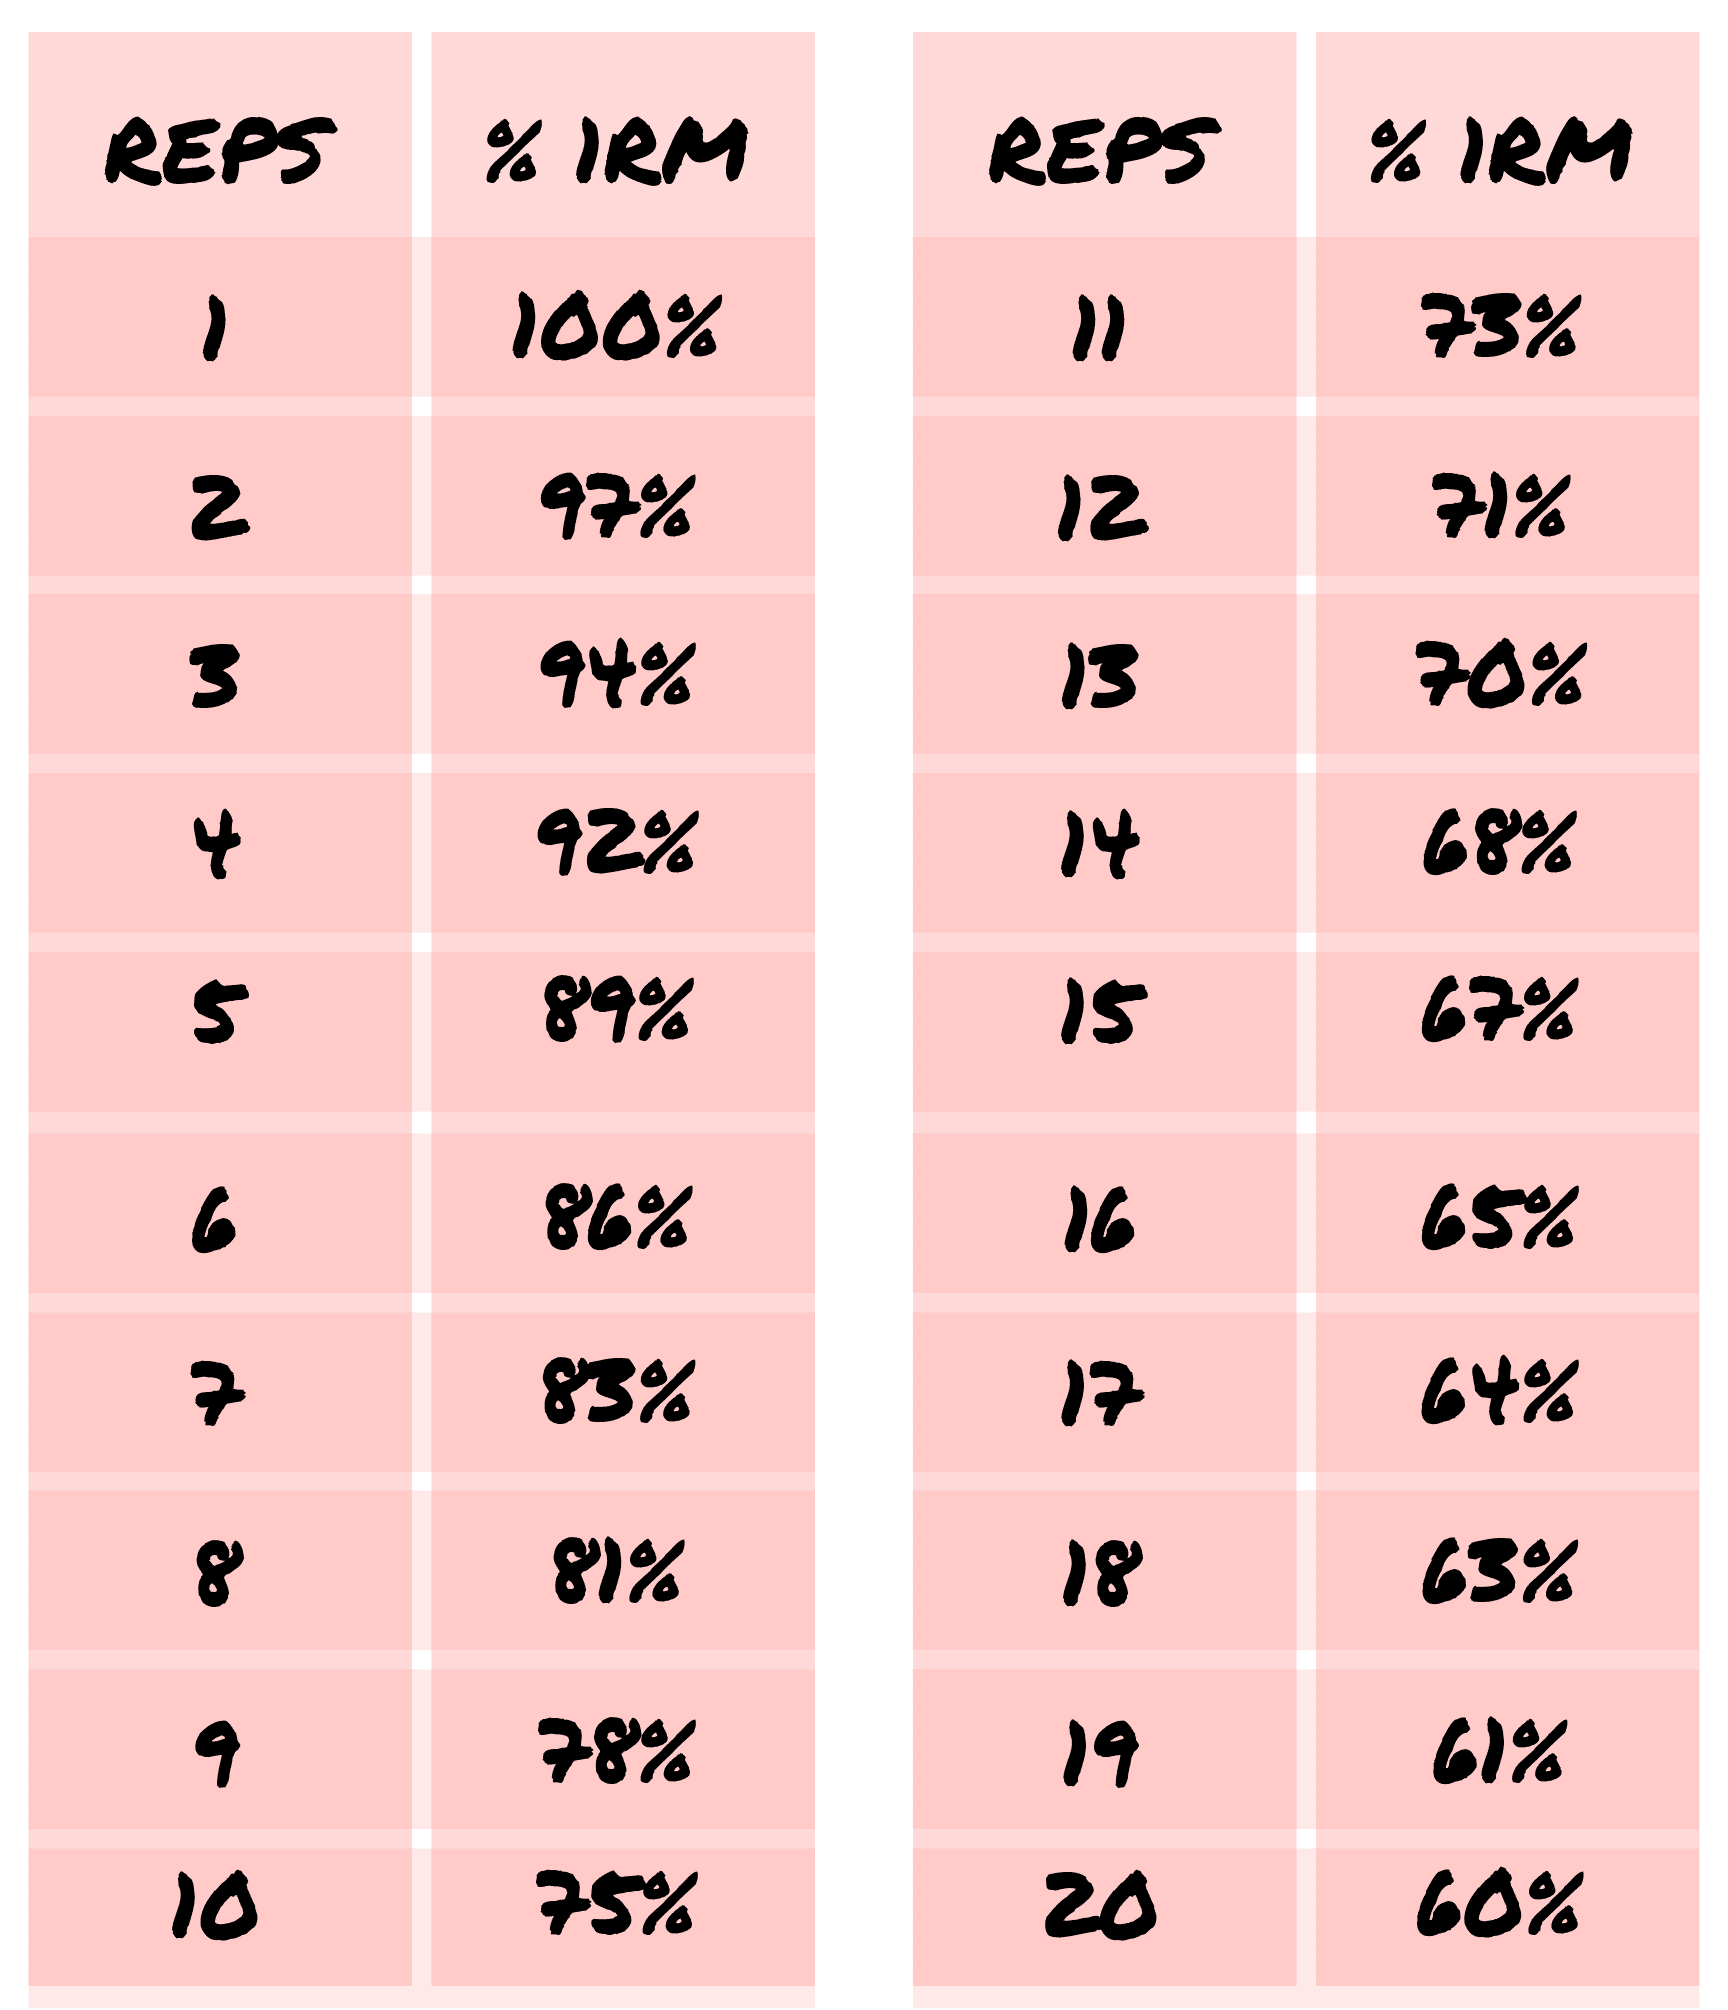 1 Rep Max Chart